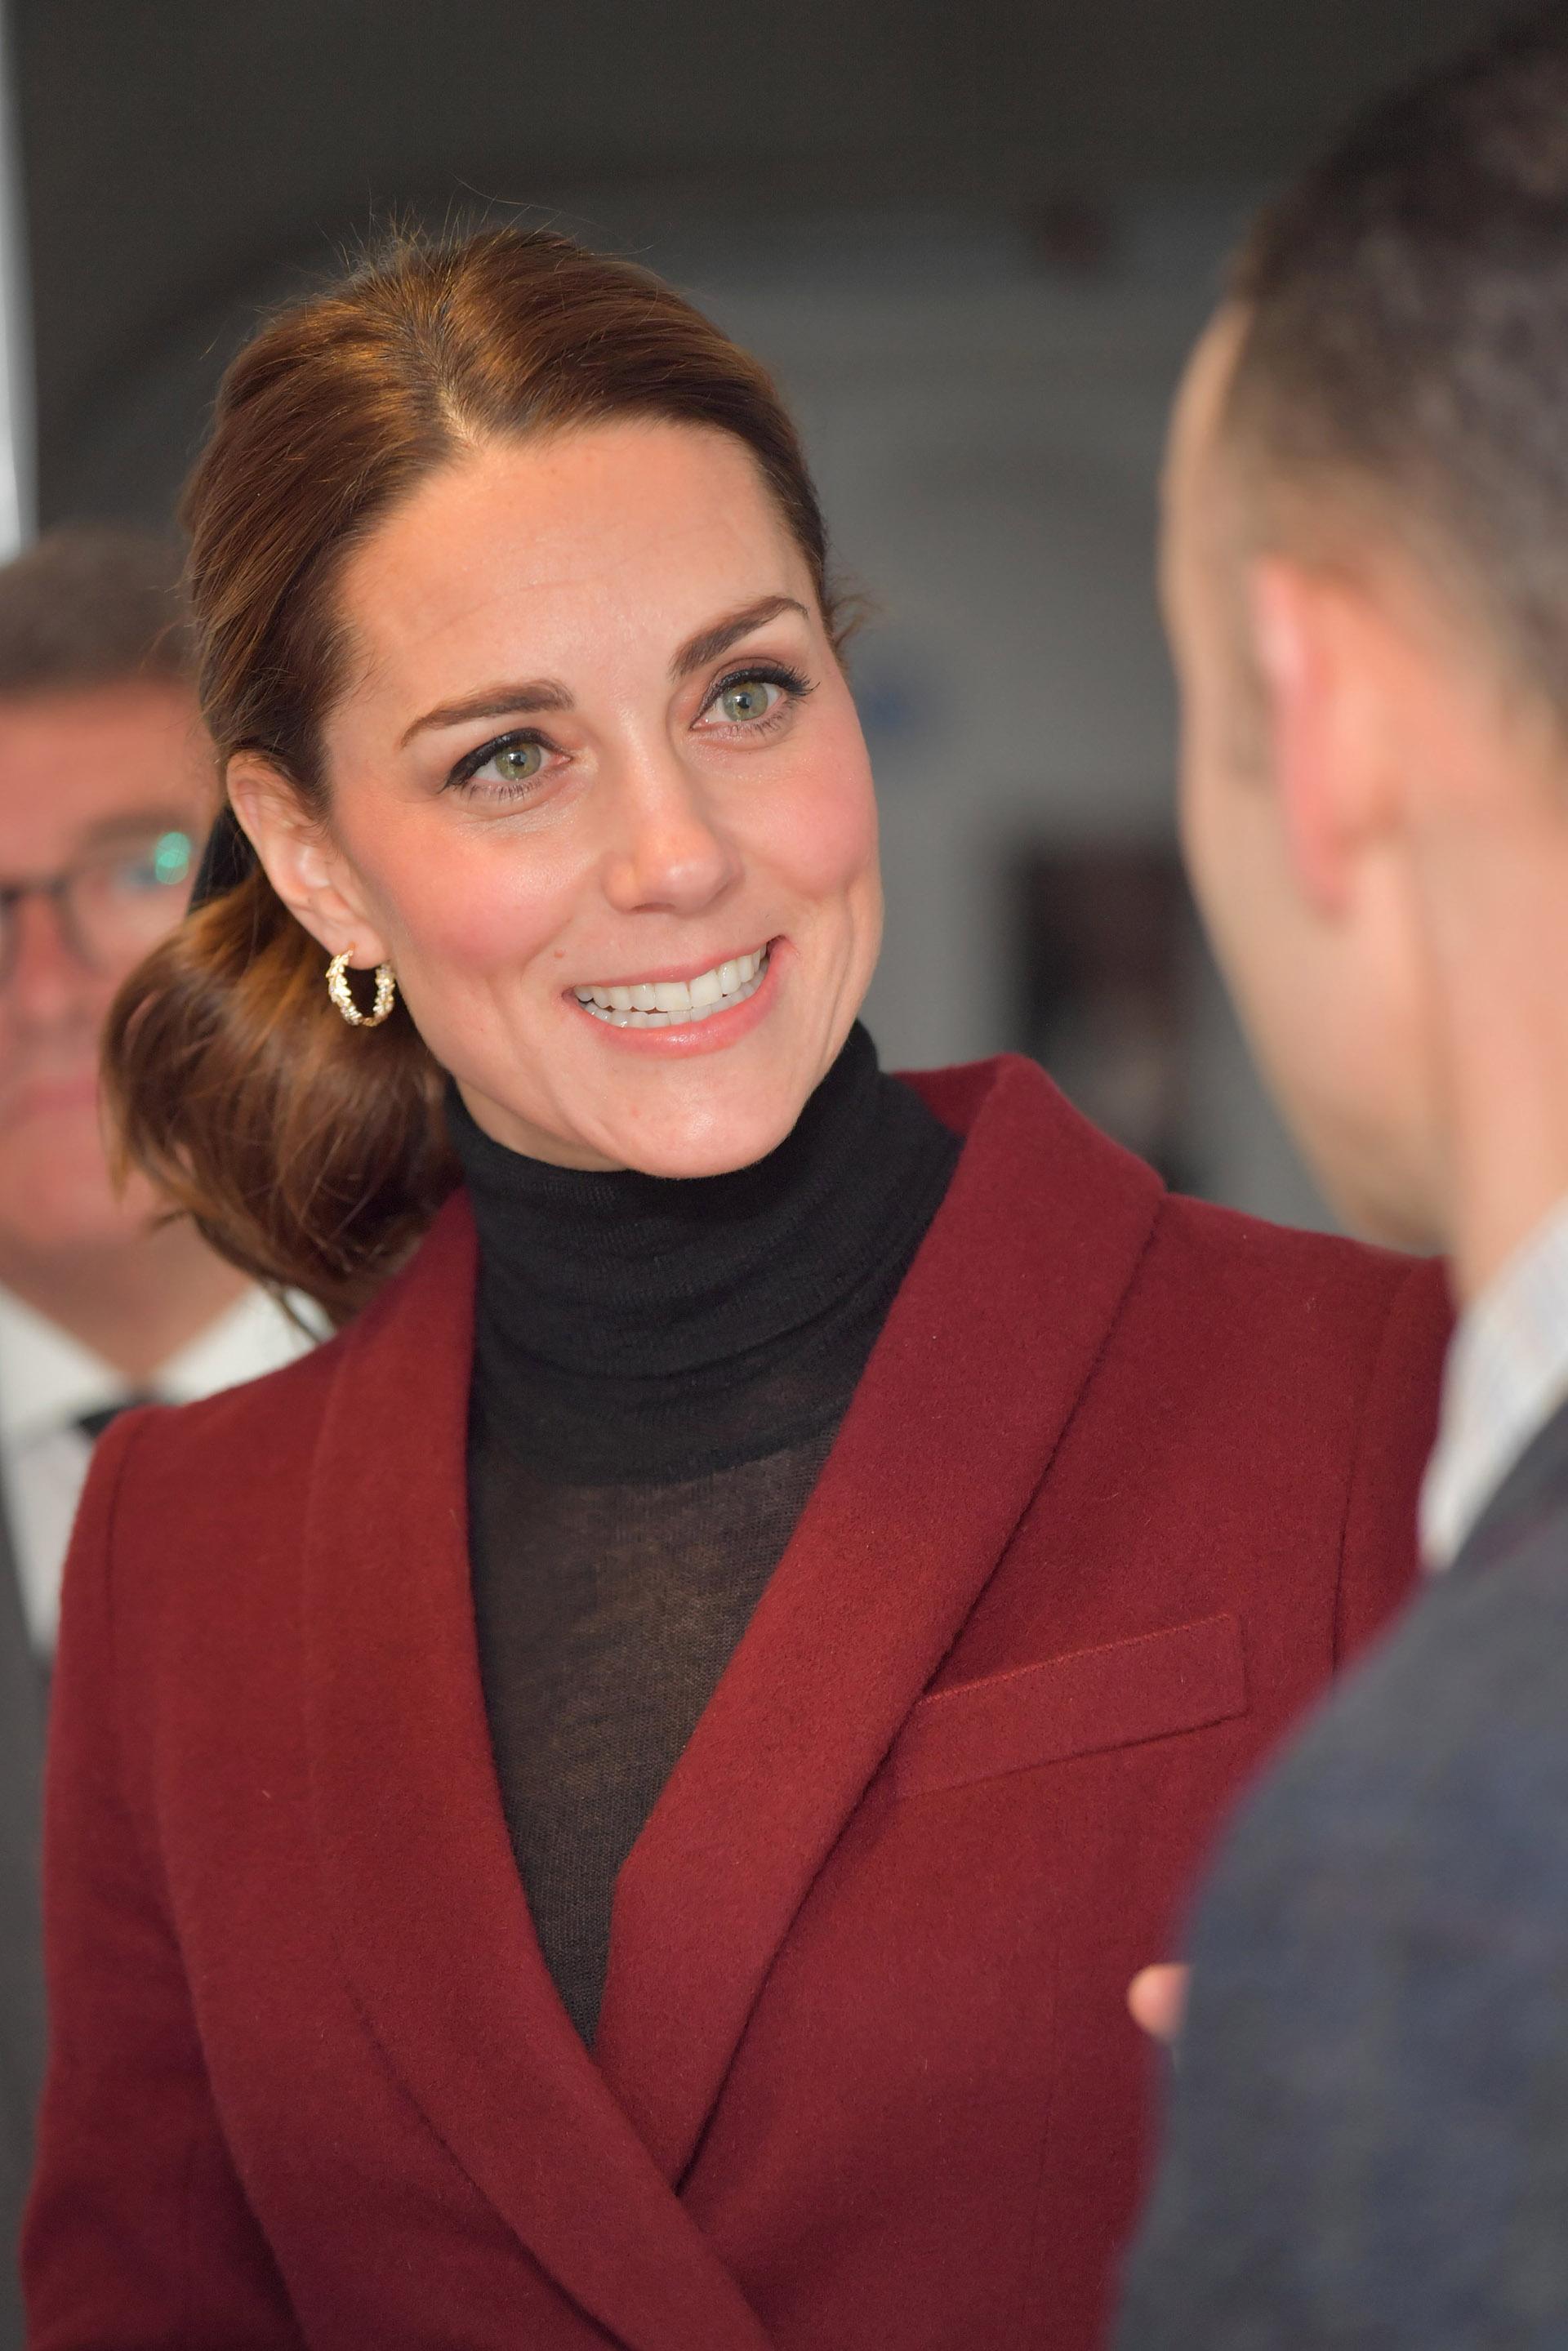 La duquesa de Cambridge a su llegada al UCL Developmental Neuroscience Laboratory, en Londres